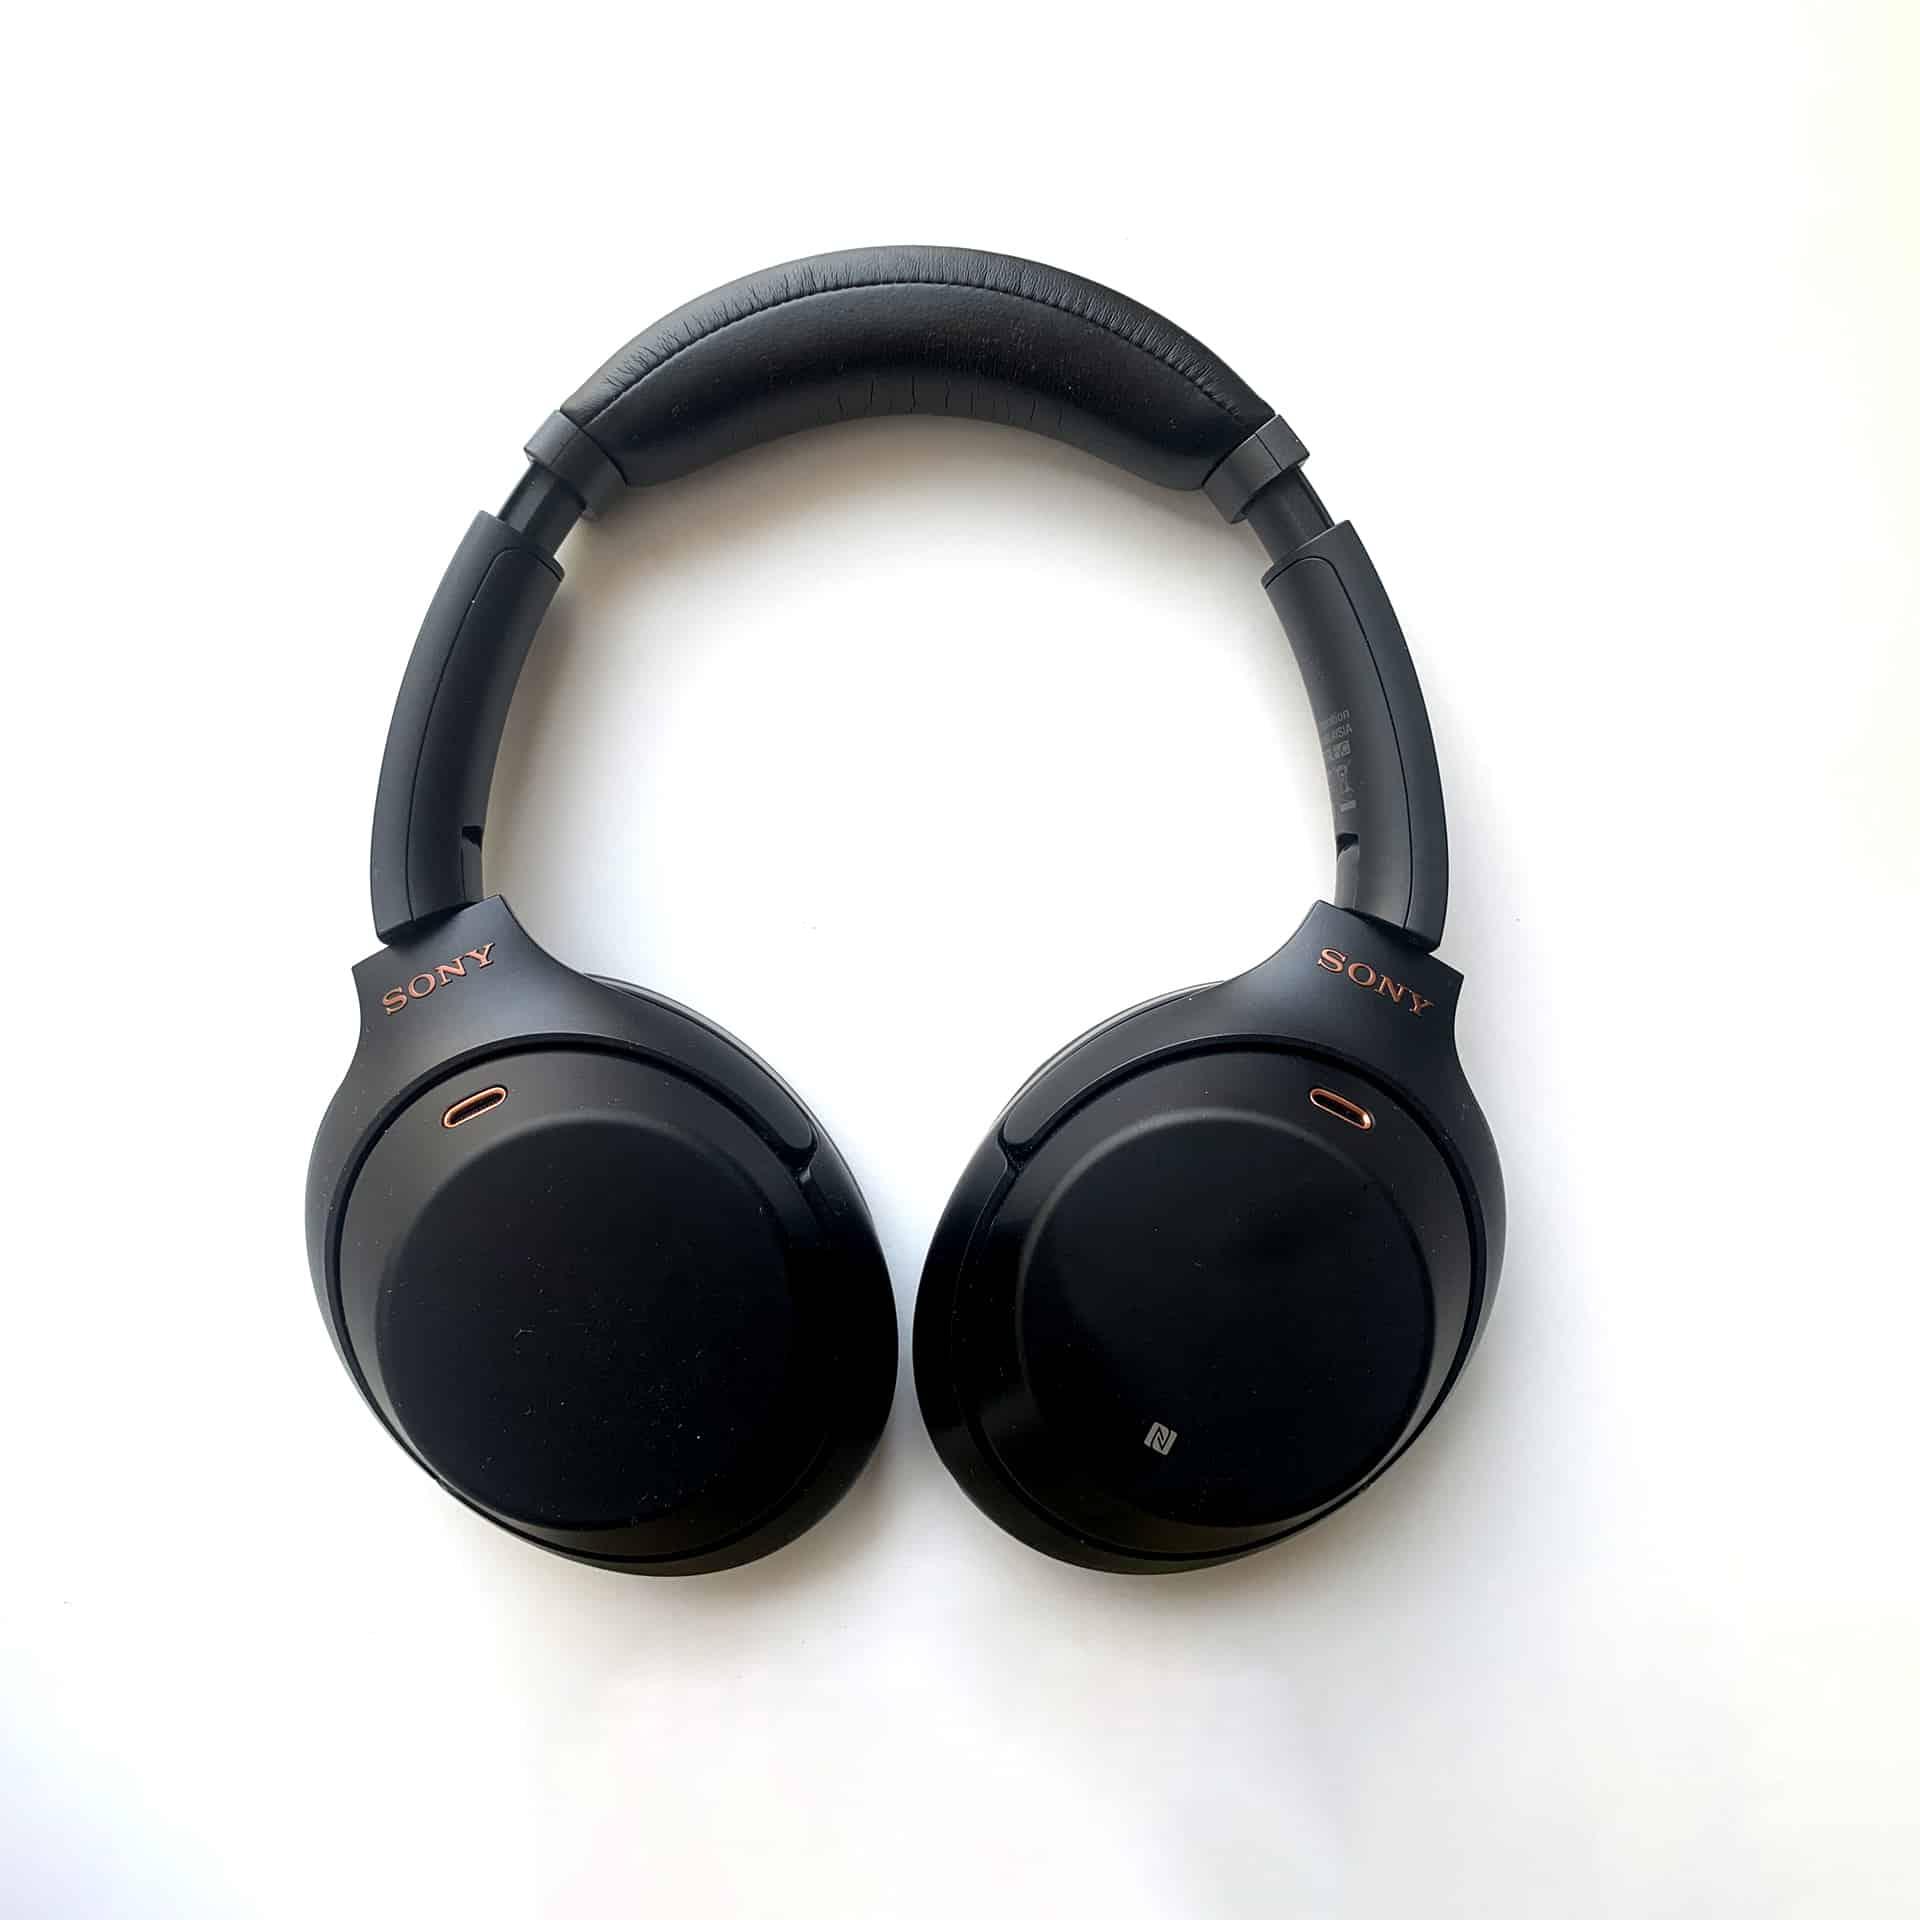 Sone WH 1000XM3 Noise Cancelling Headphones